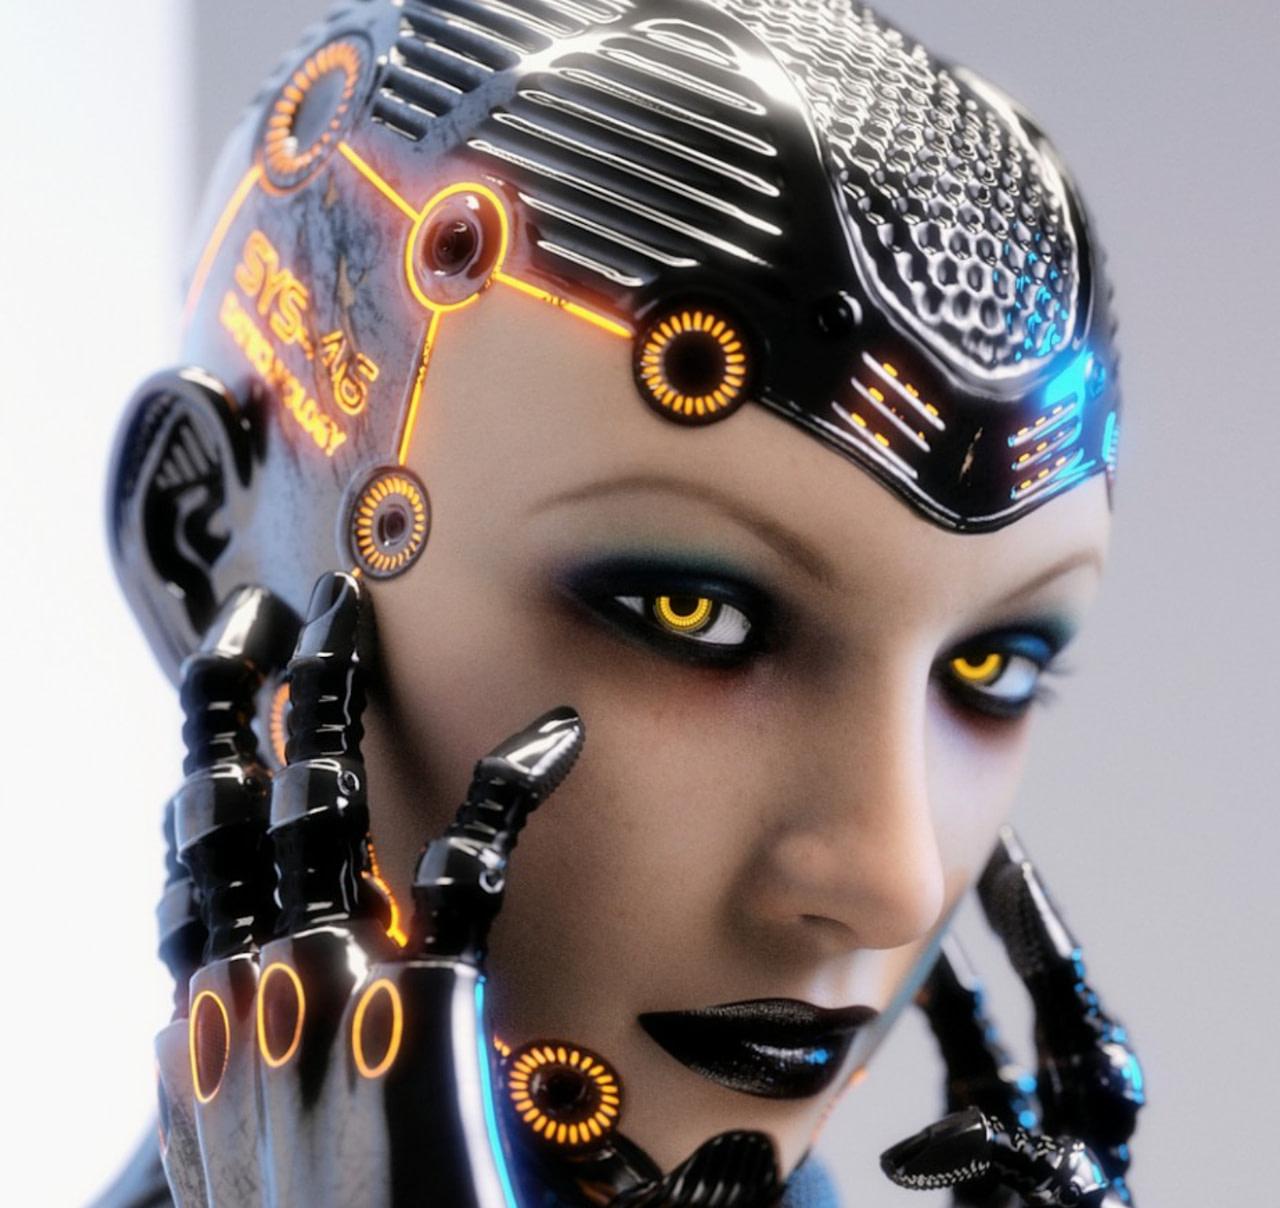 cyborg daz3d system 46 3d model